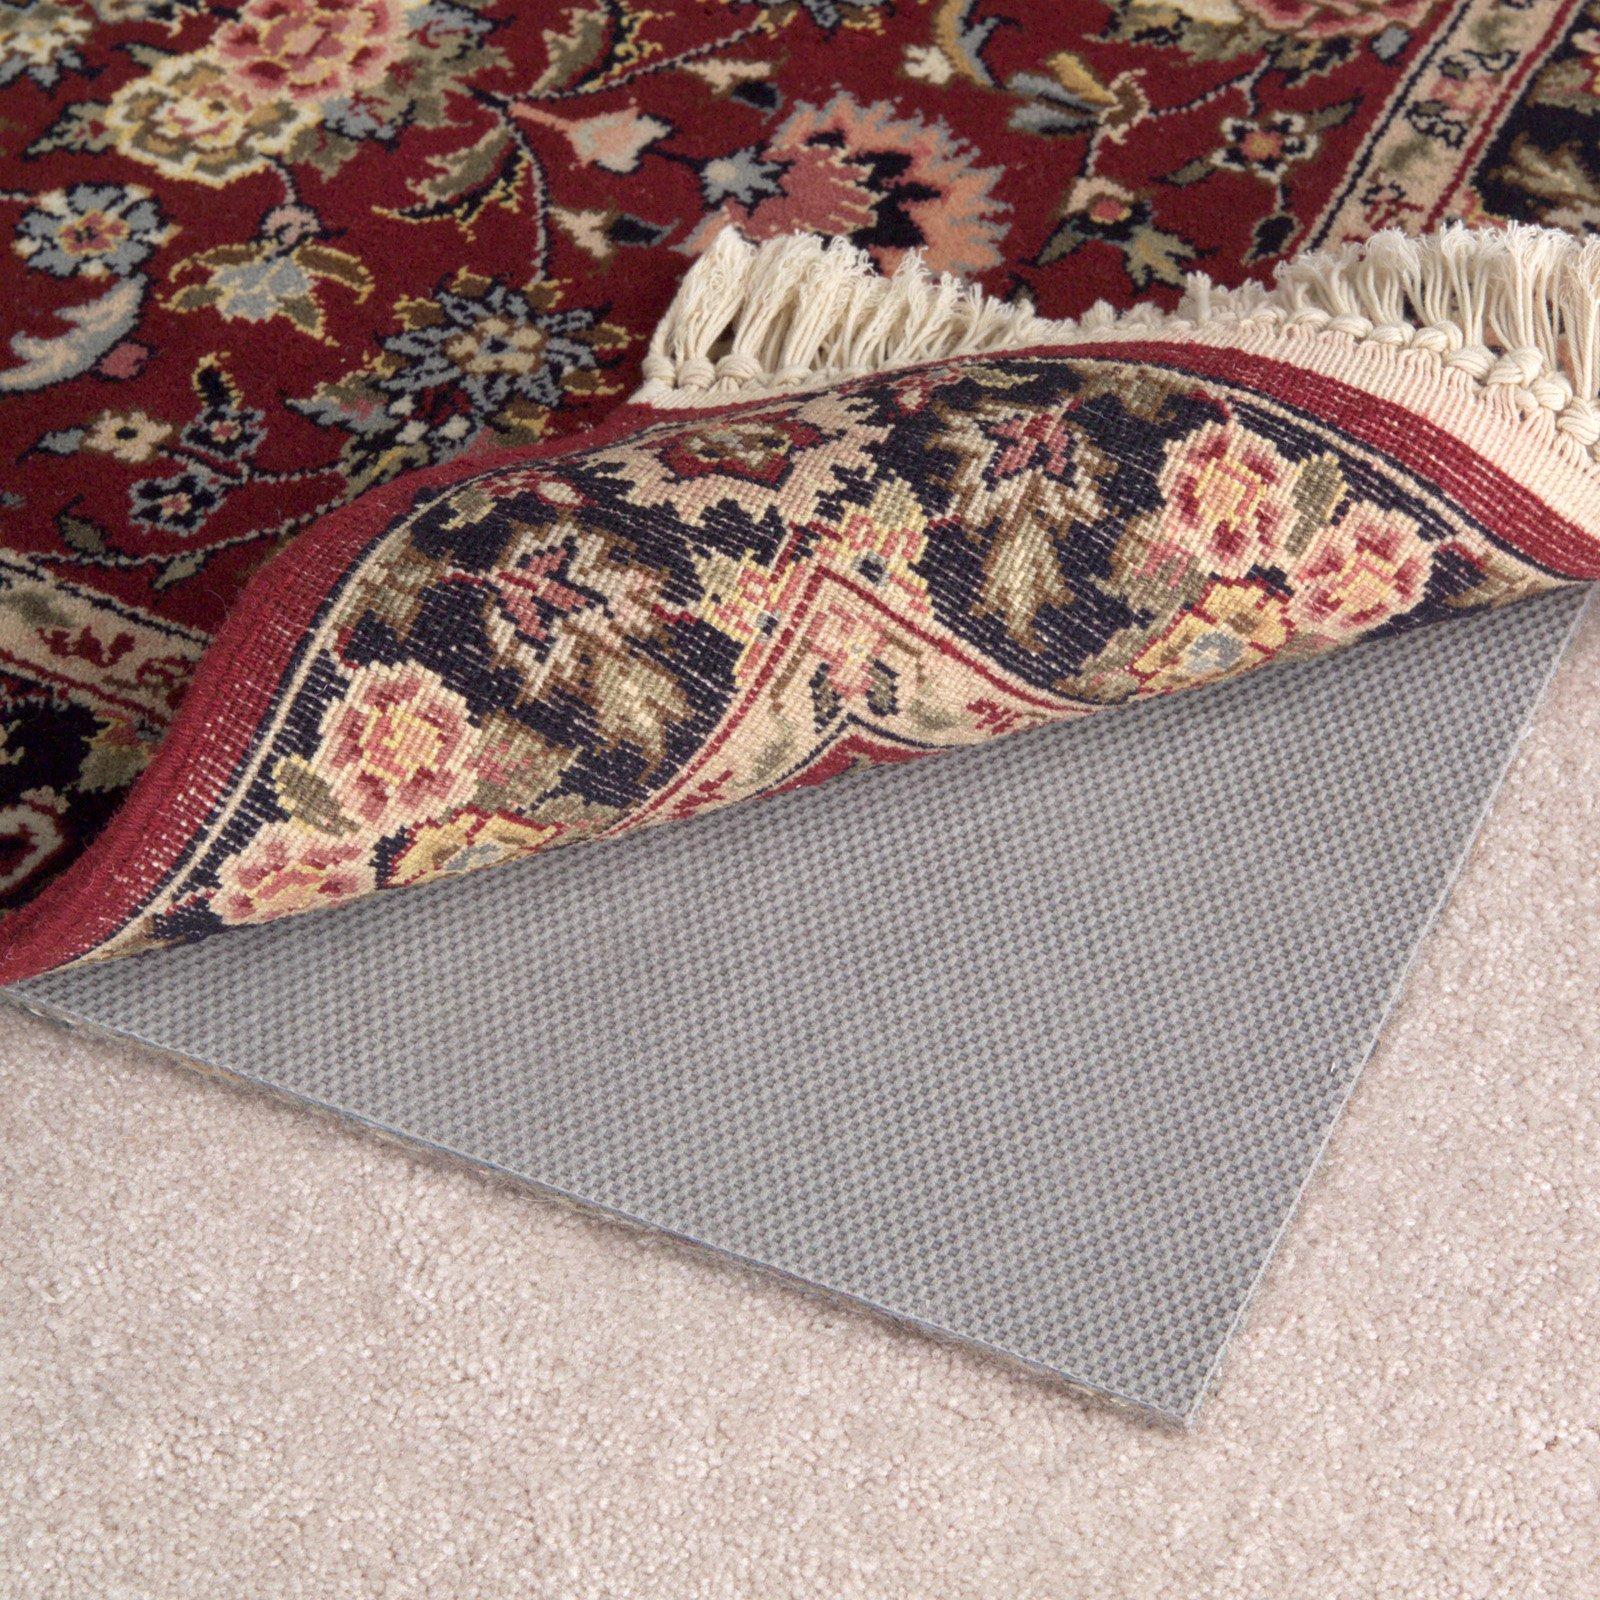 contact movenot rug pad - walmart